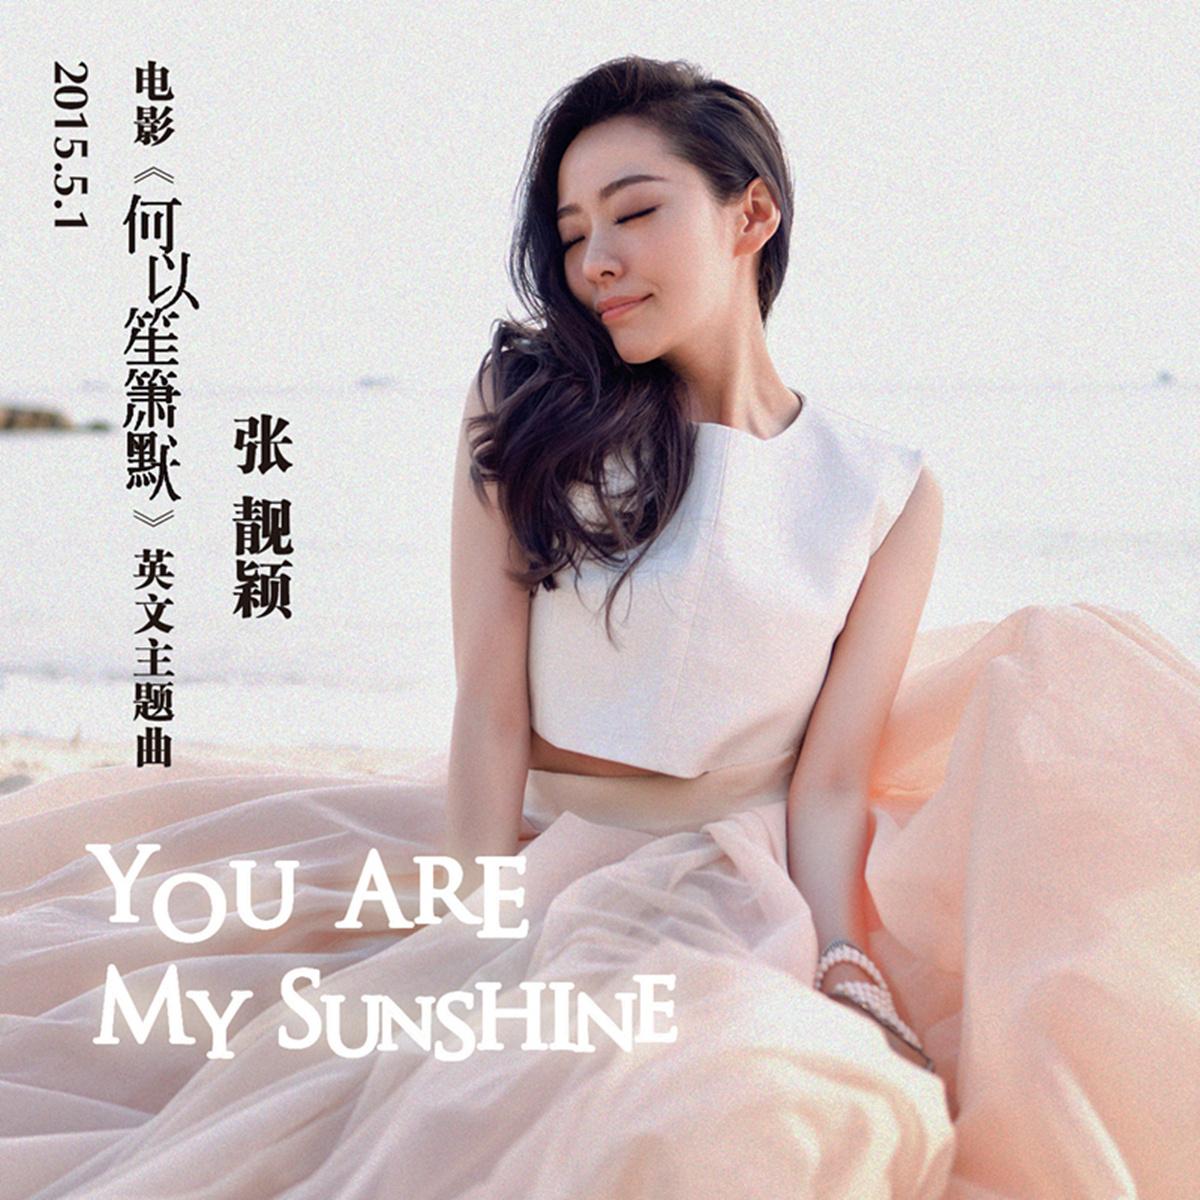 张靓颖《You Are My Sunshine》单曲试听